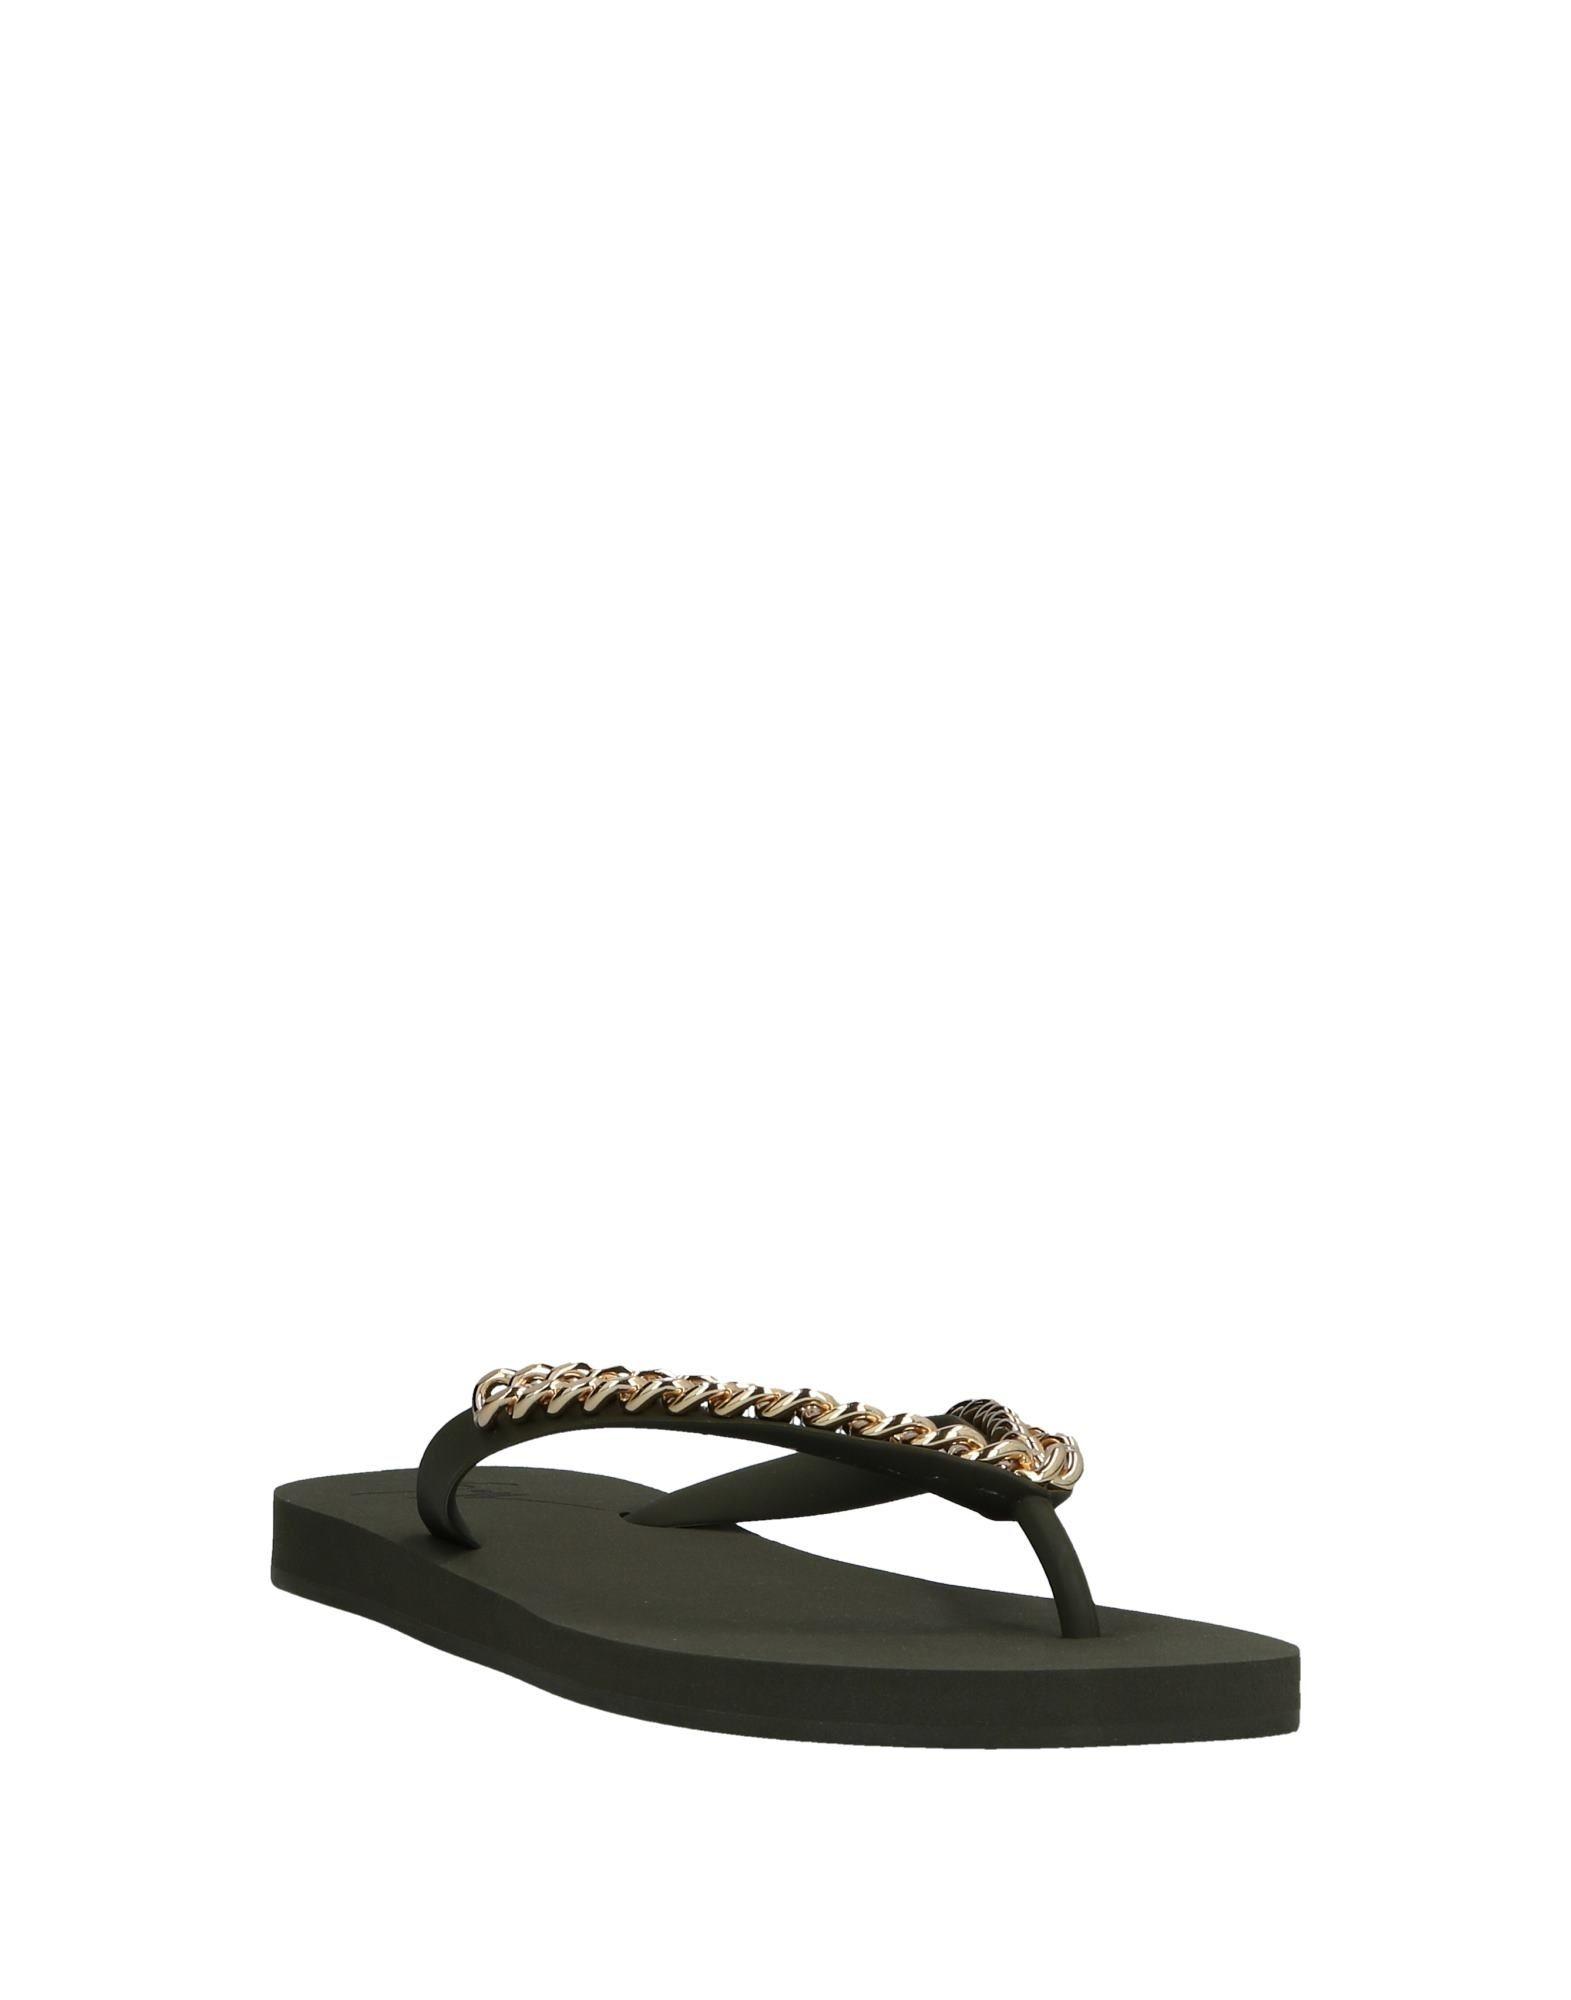 Giuseppe Zanotti Dianetten Qualität Herren  11518070HT Gute Qualität Dianetten beliebte Schuhe 194c0b